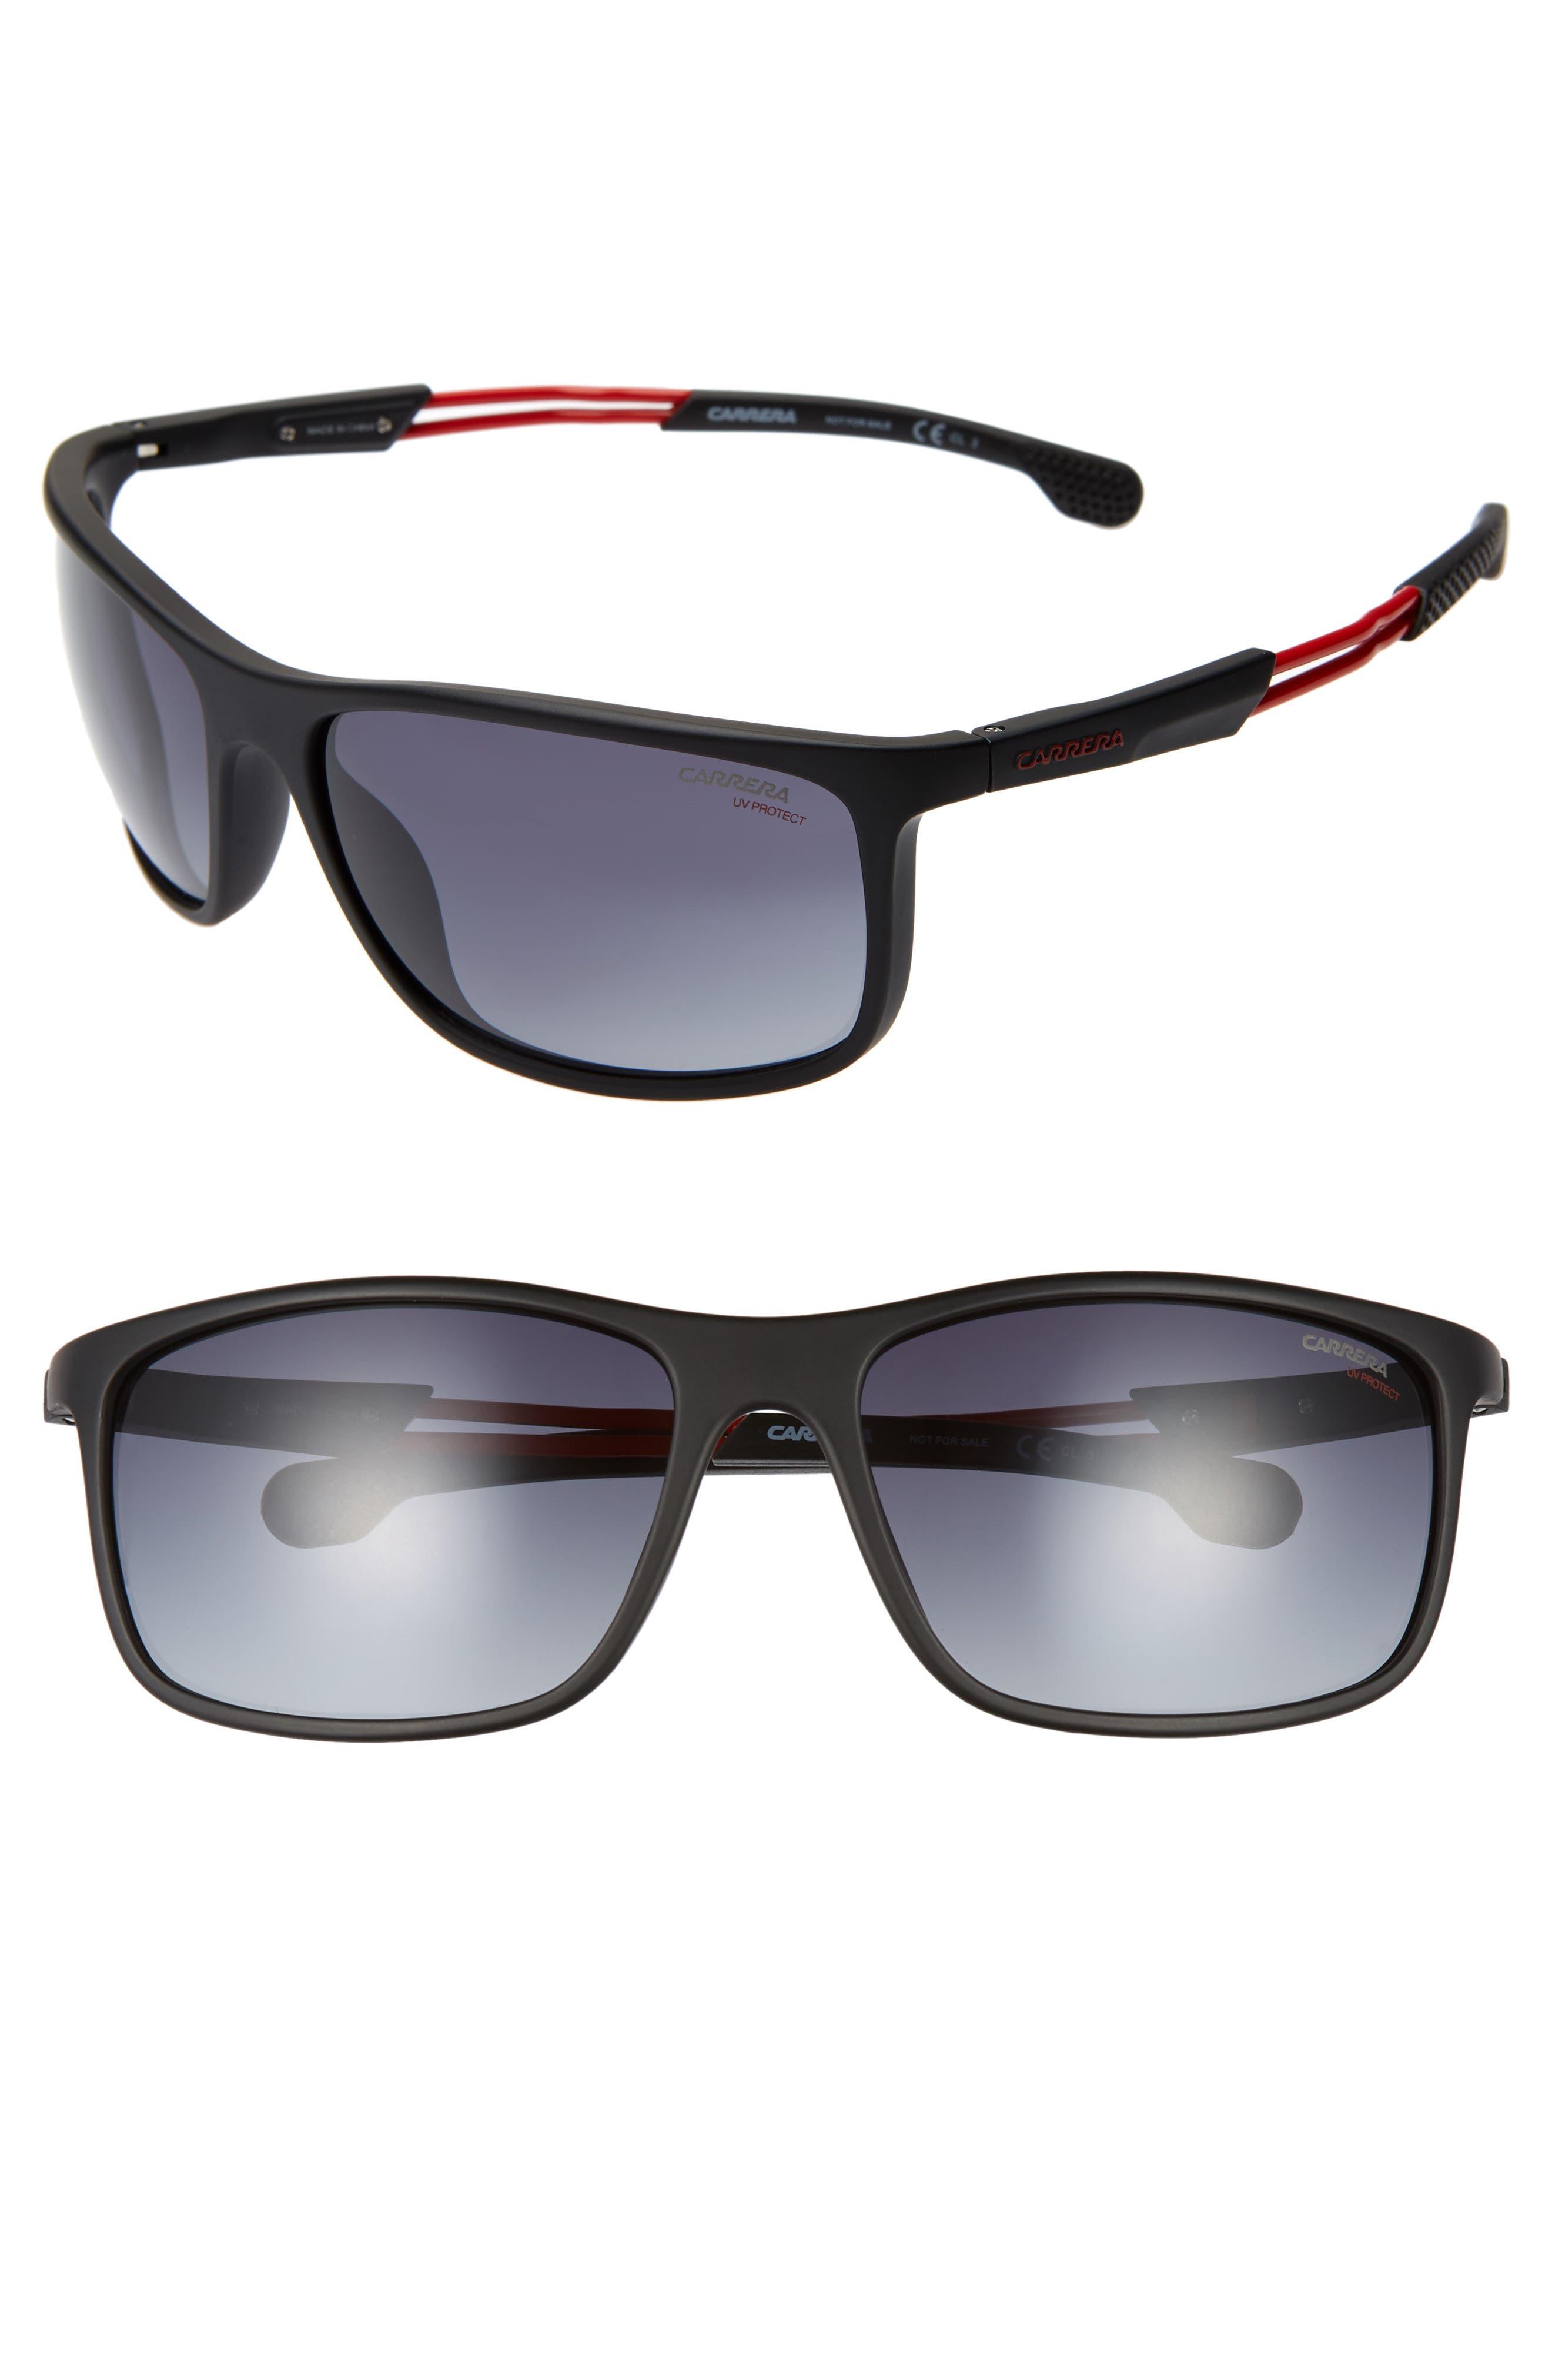 57af2471f237 Carrera Eyewear 62Mm Wrap Sunglasses - Matte Black/gray Gradient